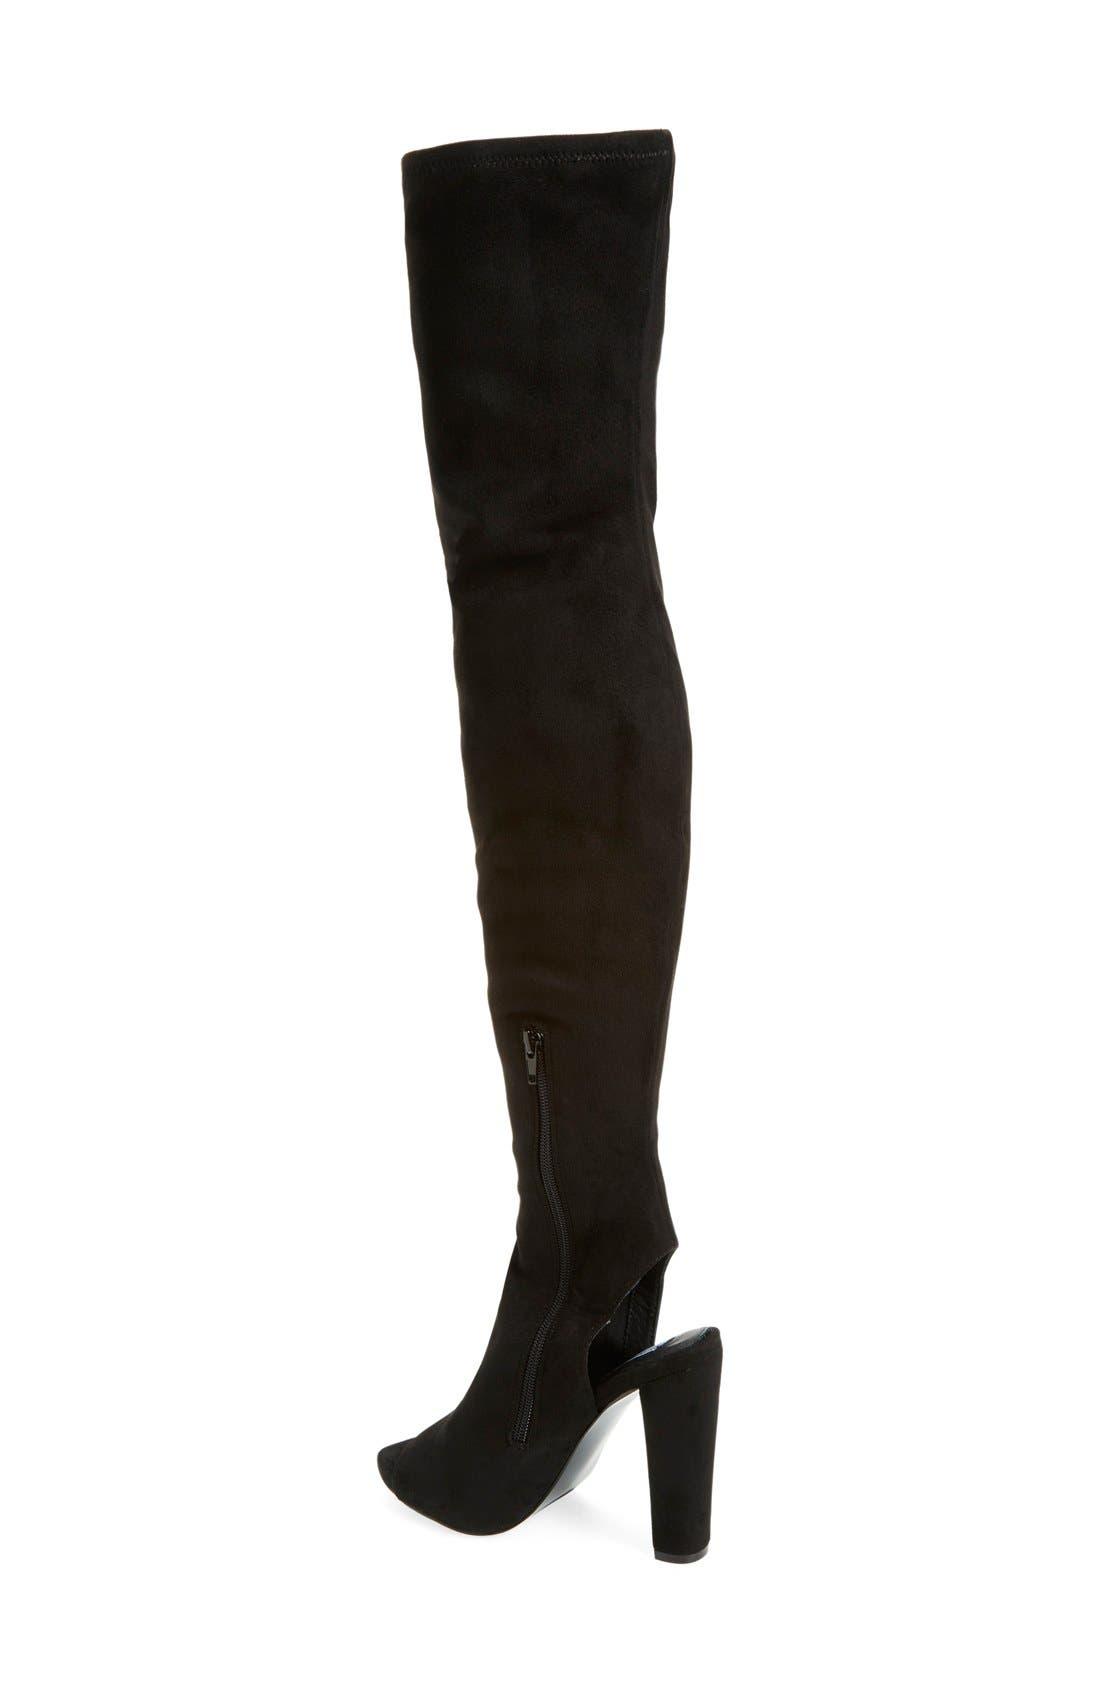 Alternate Image 3  - Steve Madden 'Yimme' Over the Knee Boot (Women) (Wide Calf)